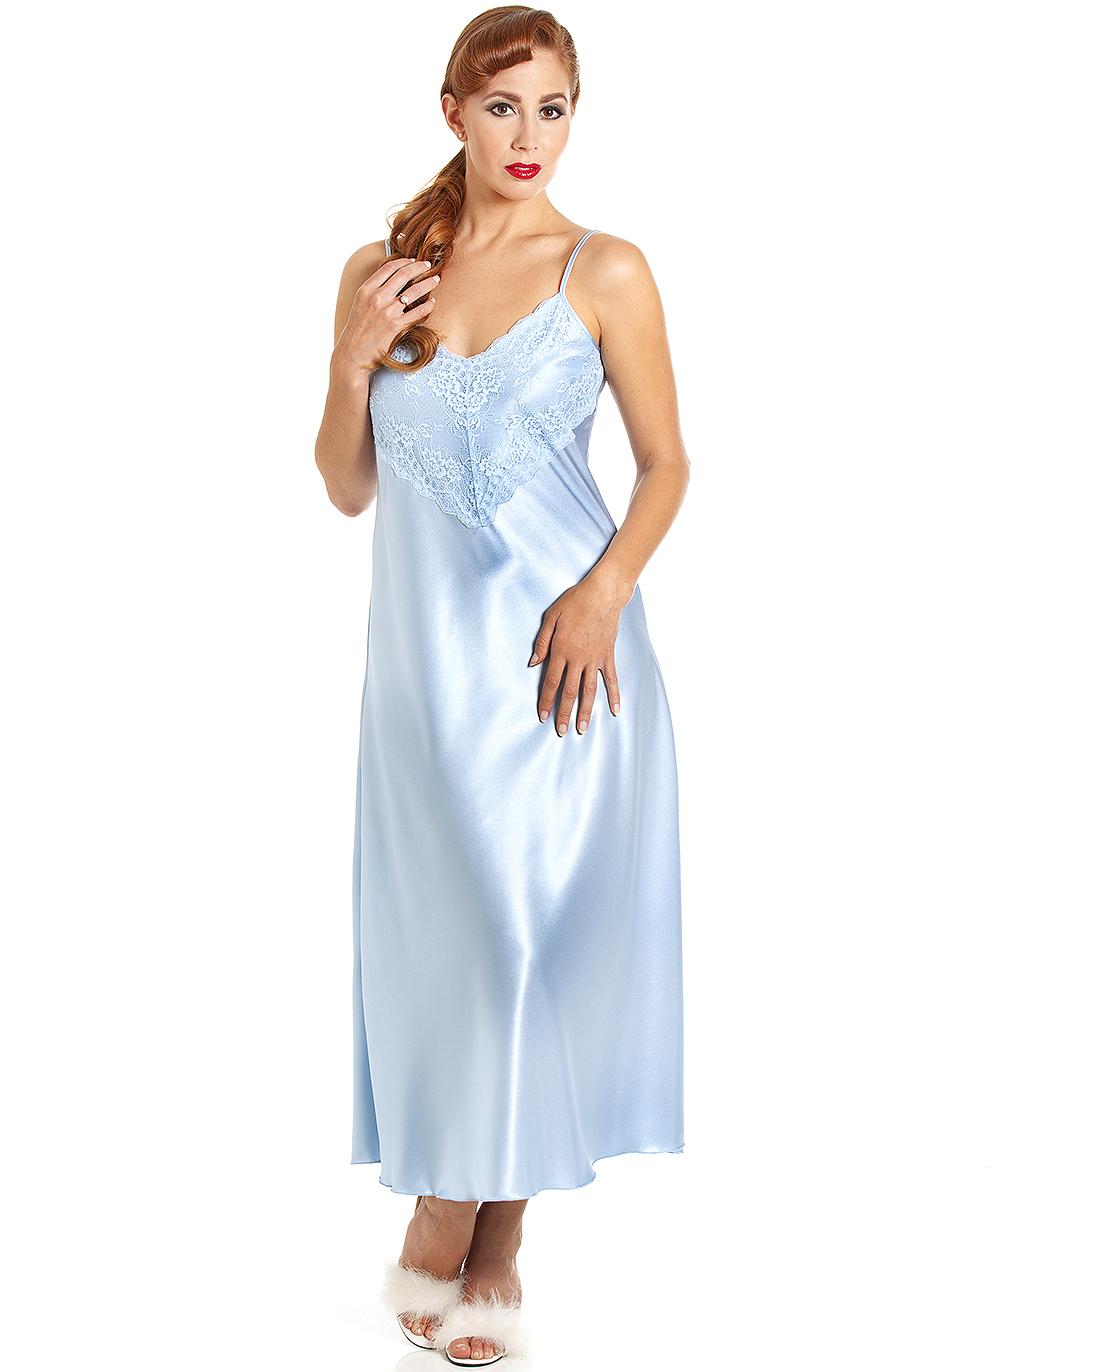 4a05f0f4dfd Jane Lace Trim Satin Long Nightdress - Arcadian Blue - Cosmic Girl ...